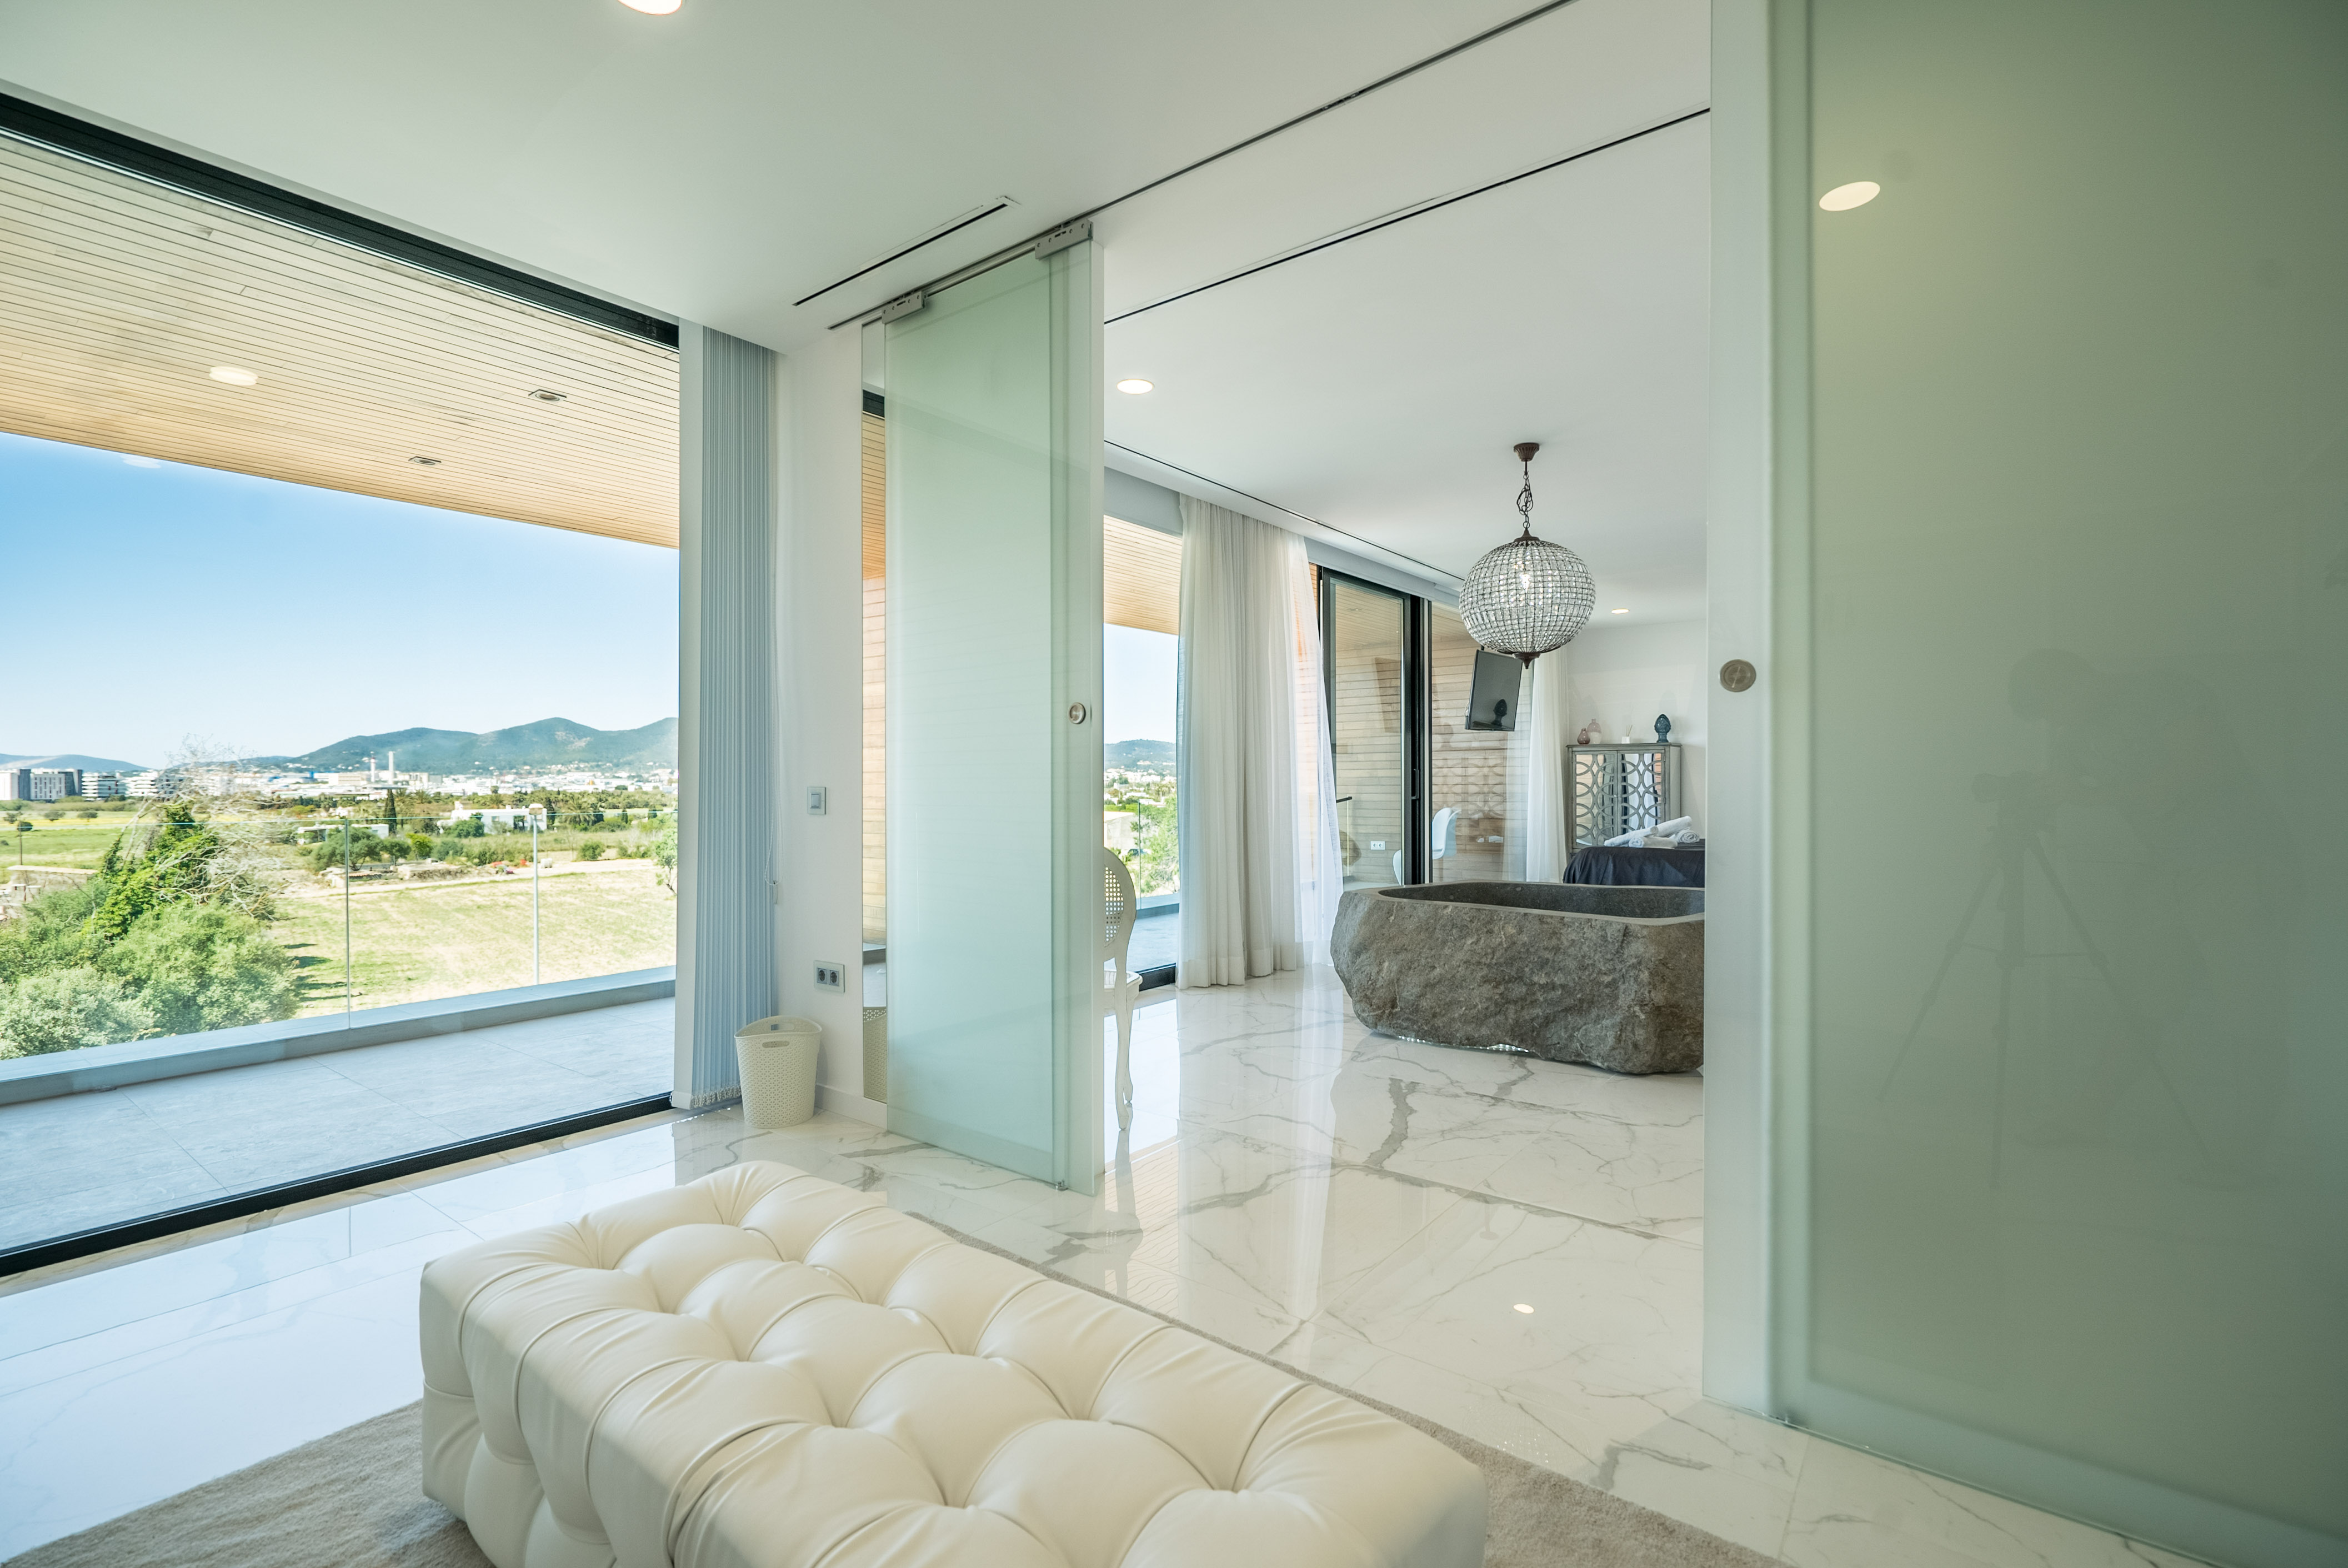 VILLA VALERIA - Master Suite Walk in Wardrobe